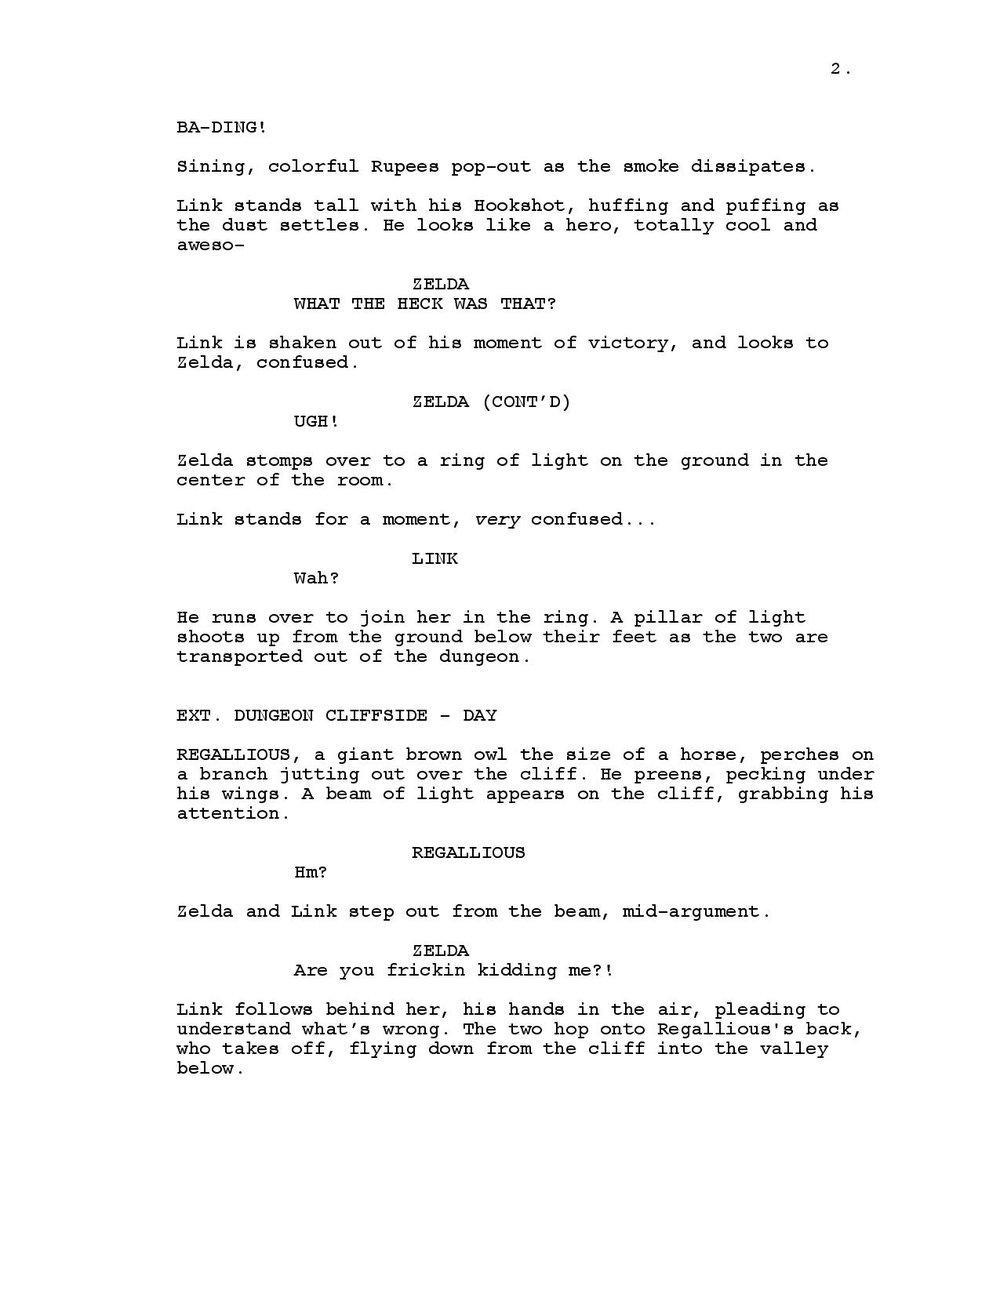 TheAdventuresofZelda&Link_Pilot-page-002.jpg